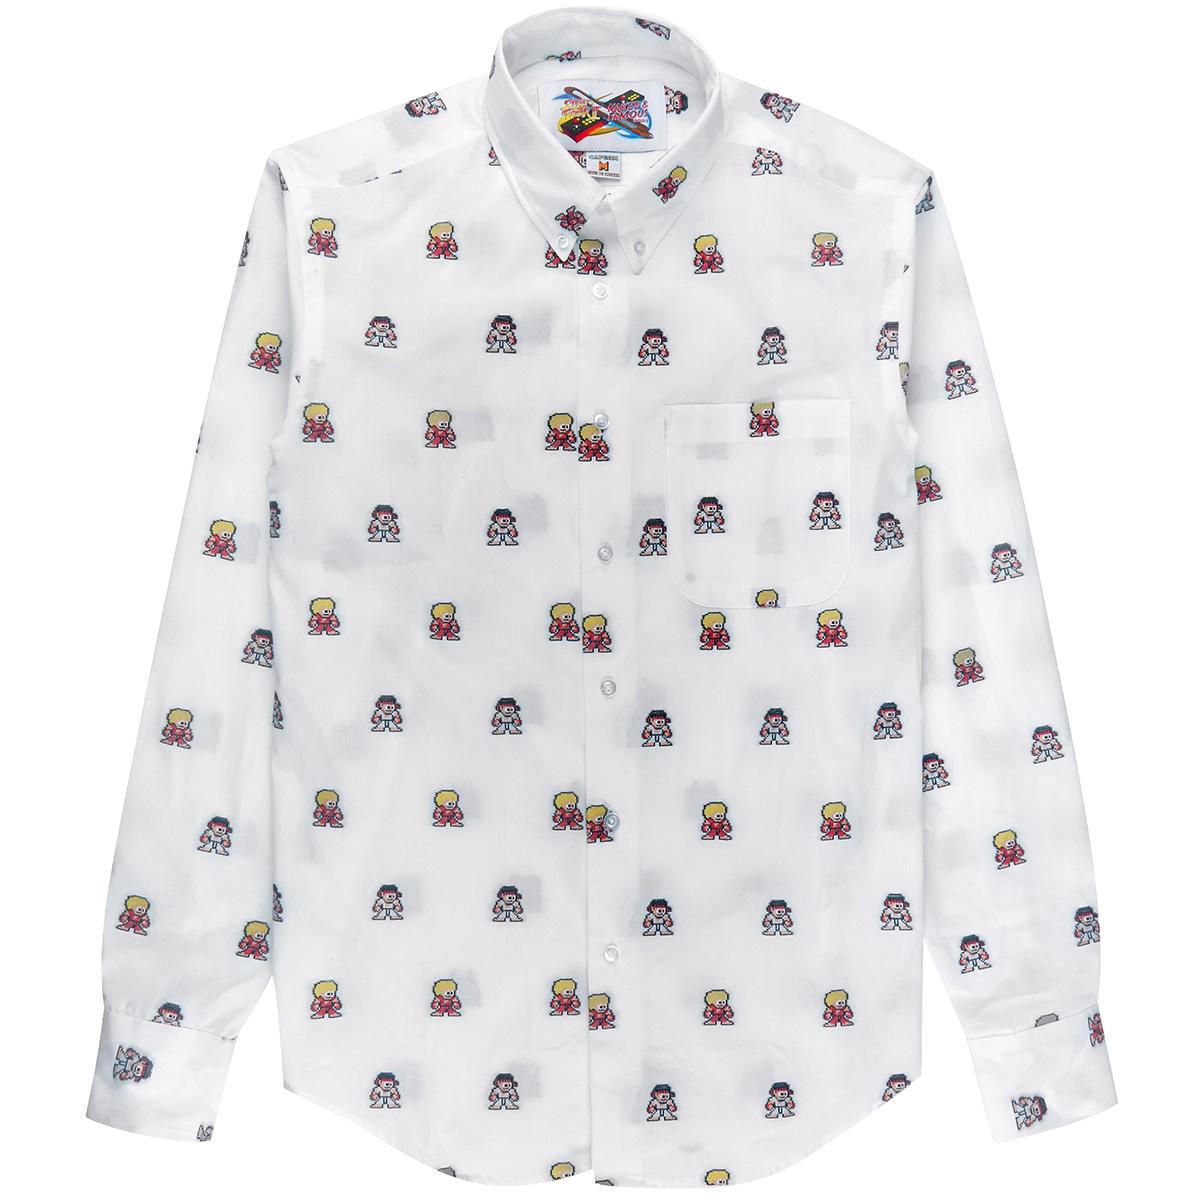 Ryu + Ken Jacquard Shirt -